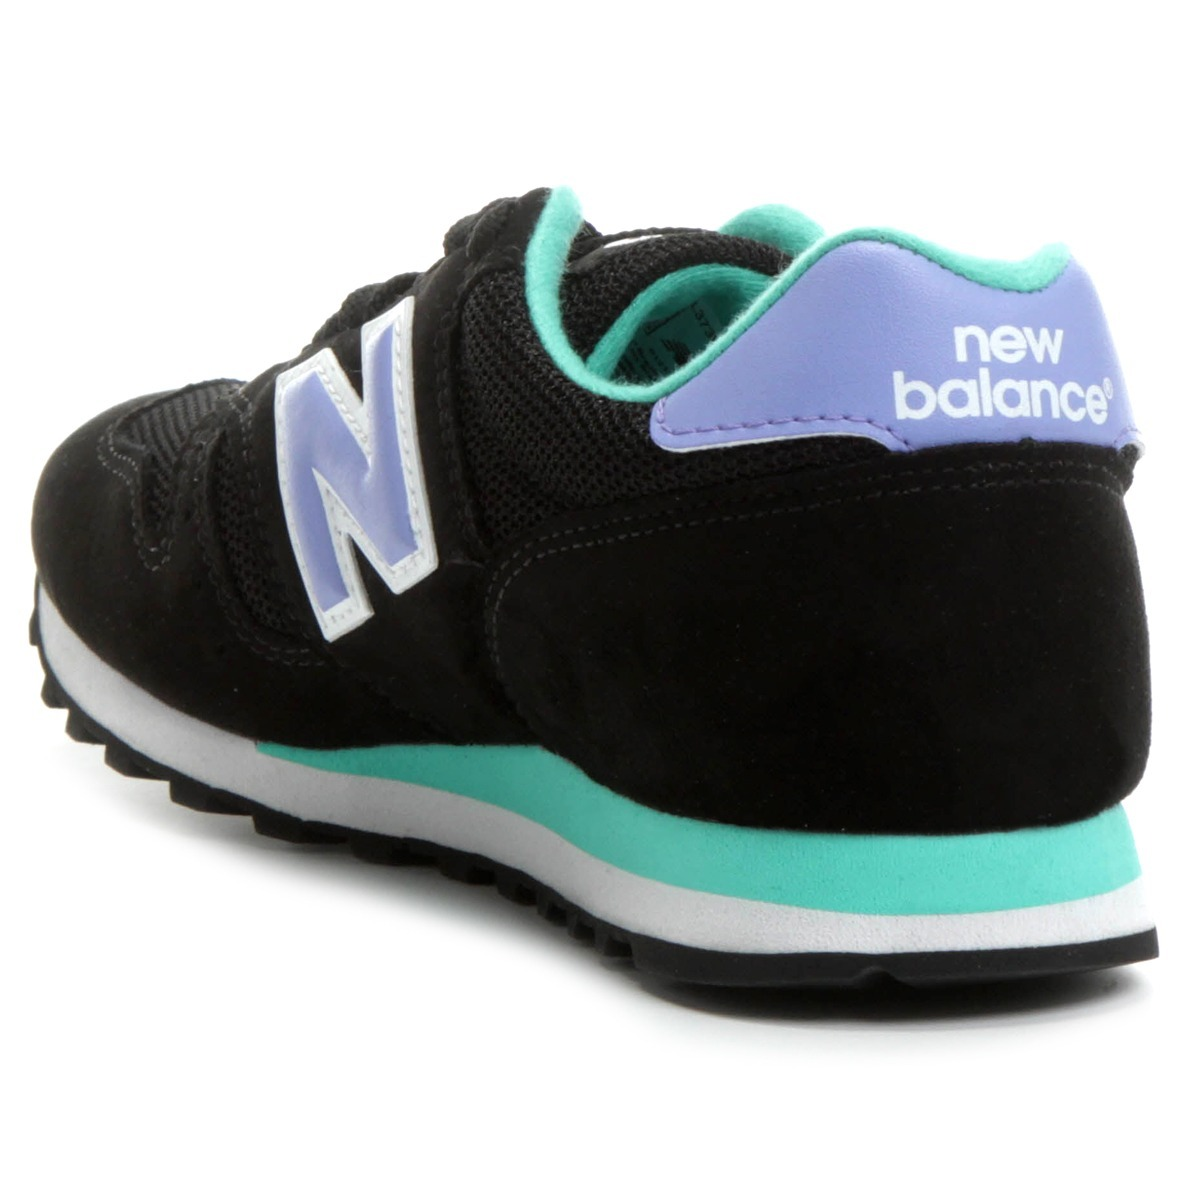 new balance mujer negras 373